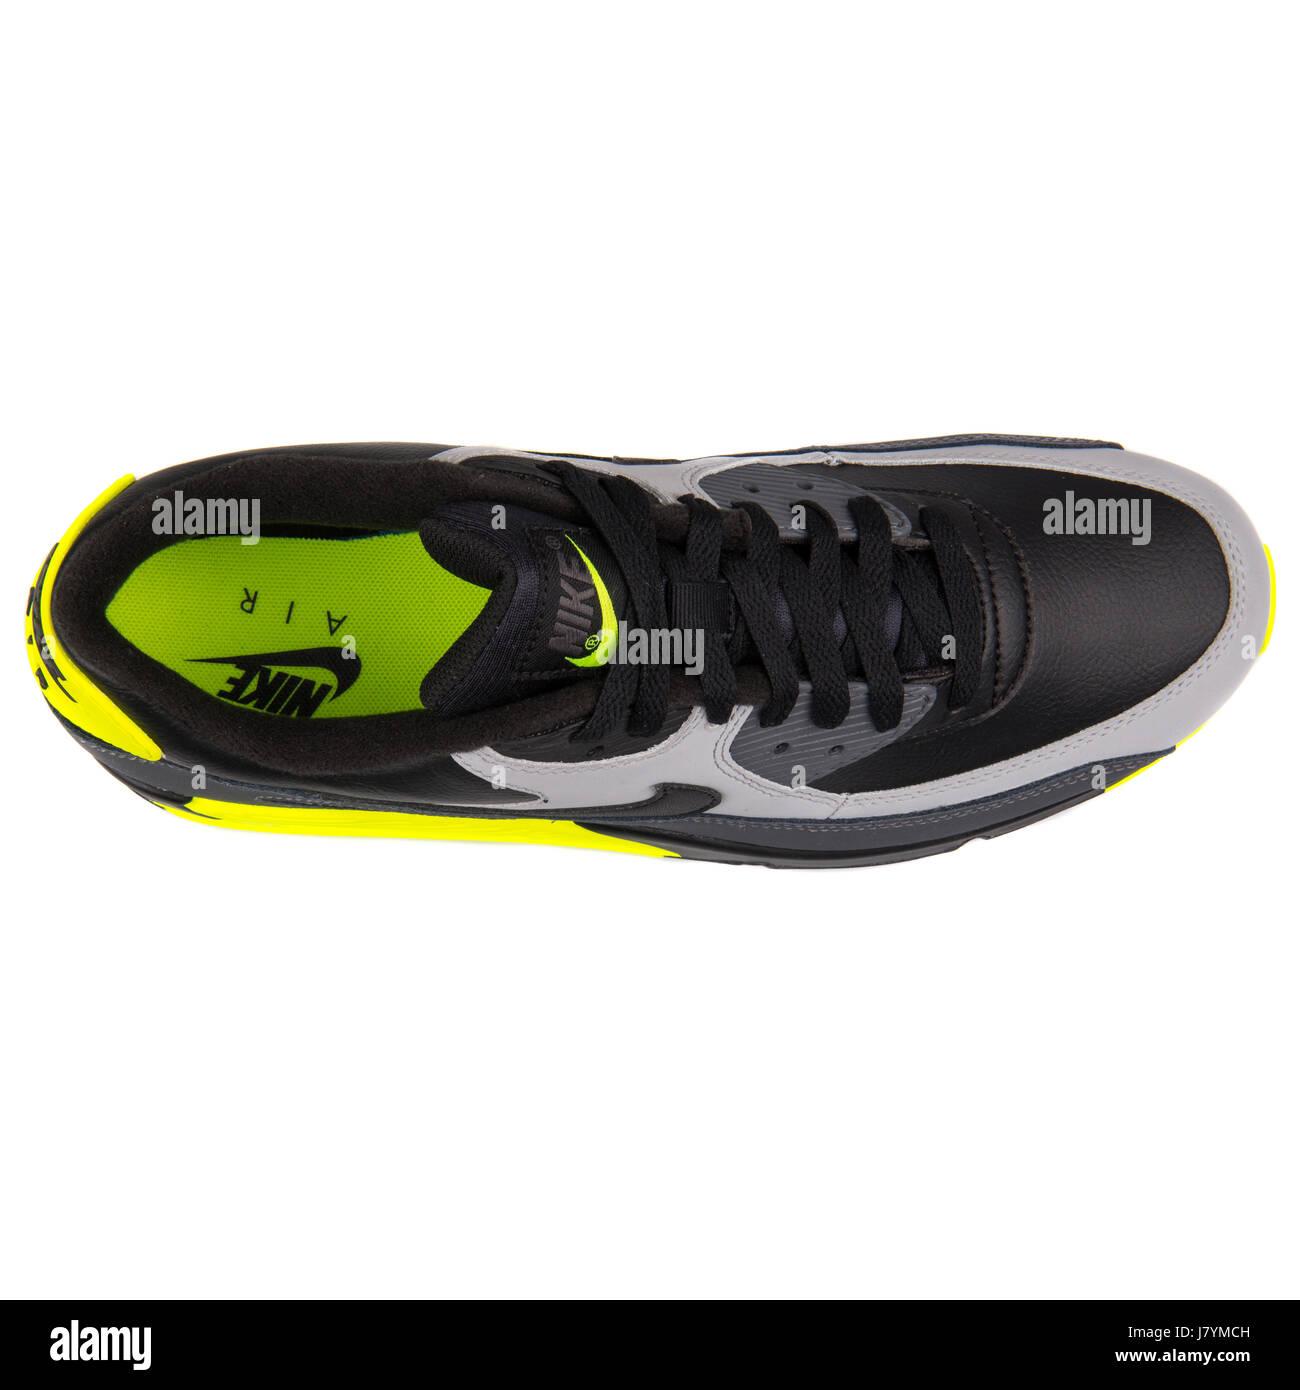 4960e6ba Nike Air Max 90 LTR Black Grey and Yellow Men Sports Sneakers - 652980-007